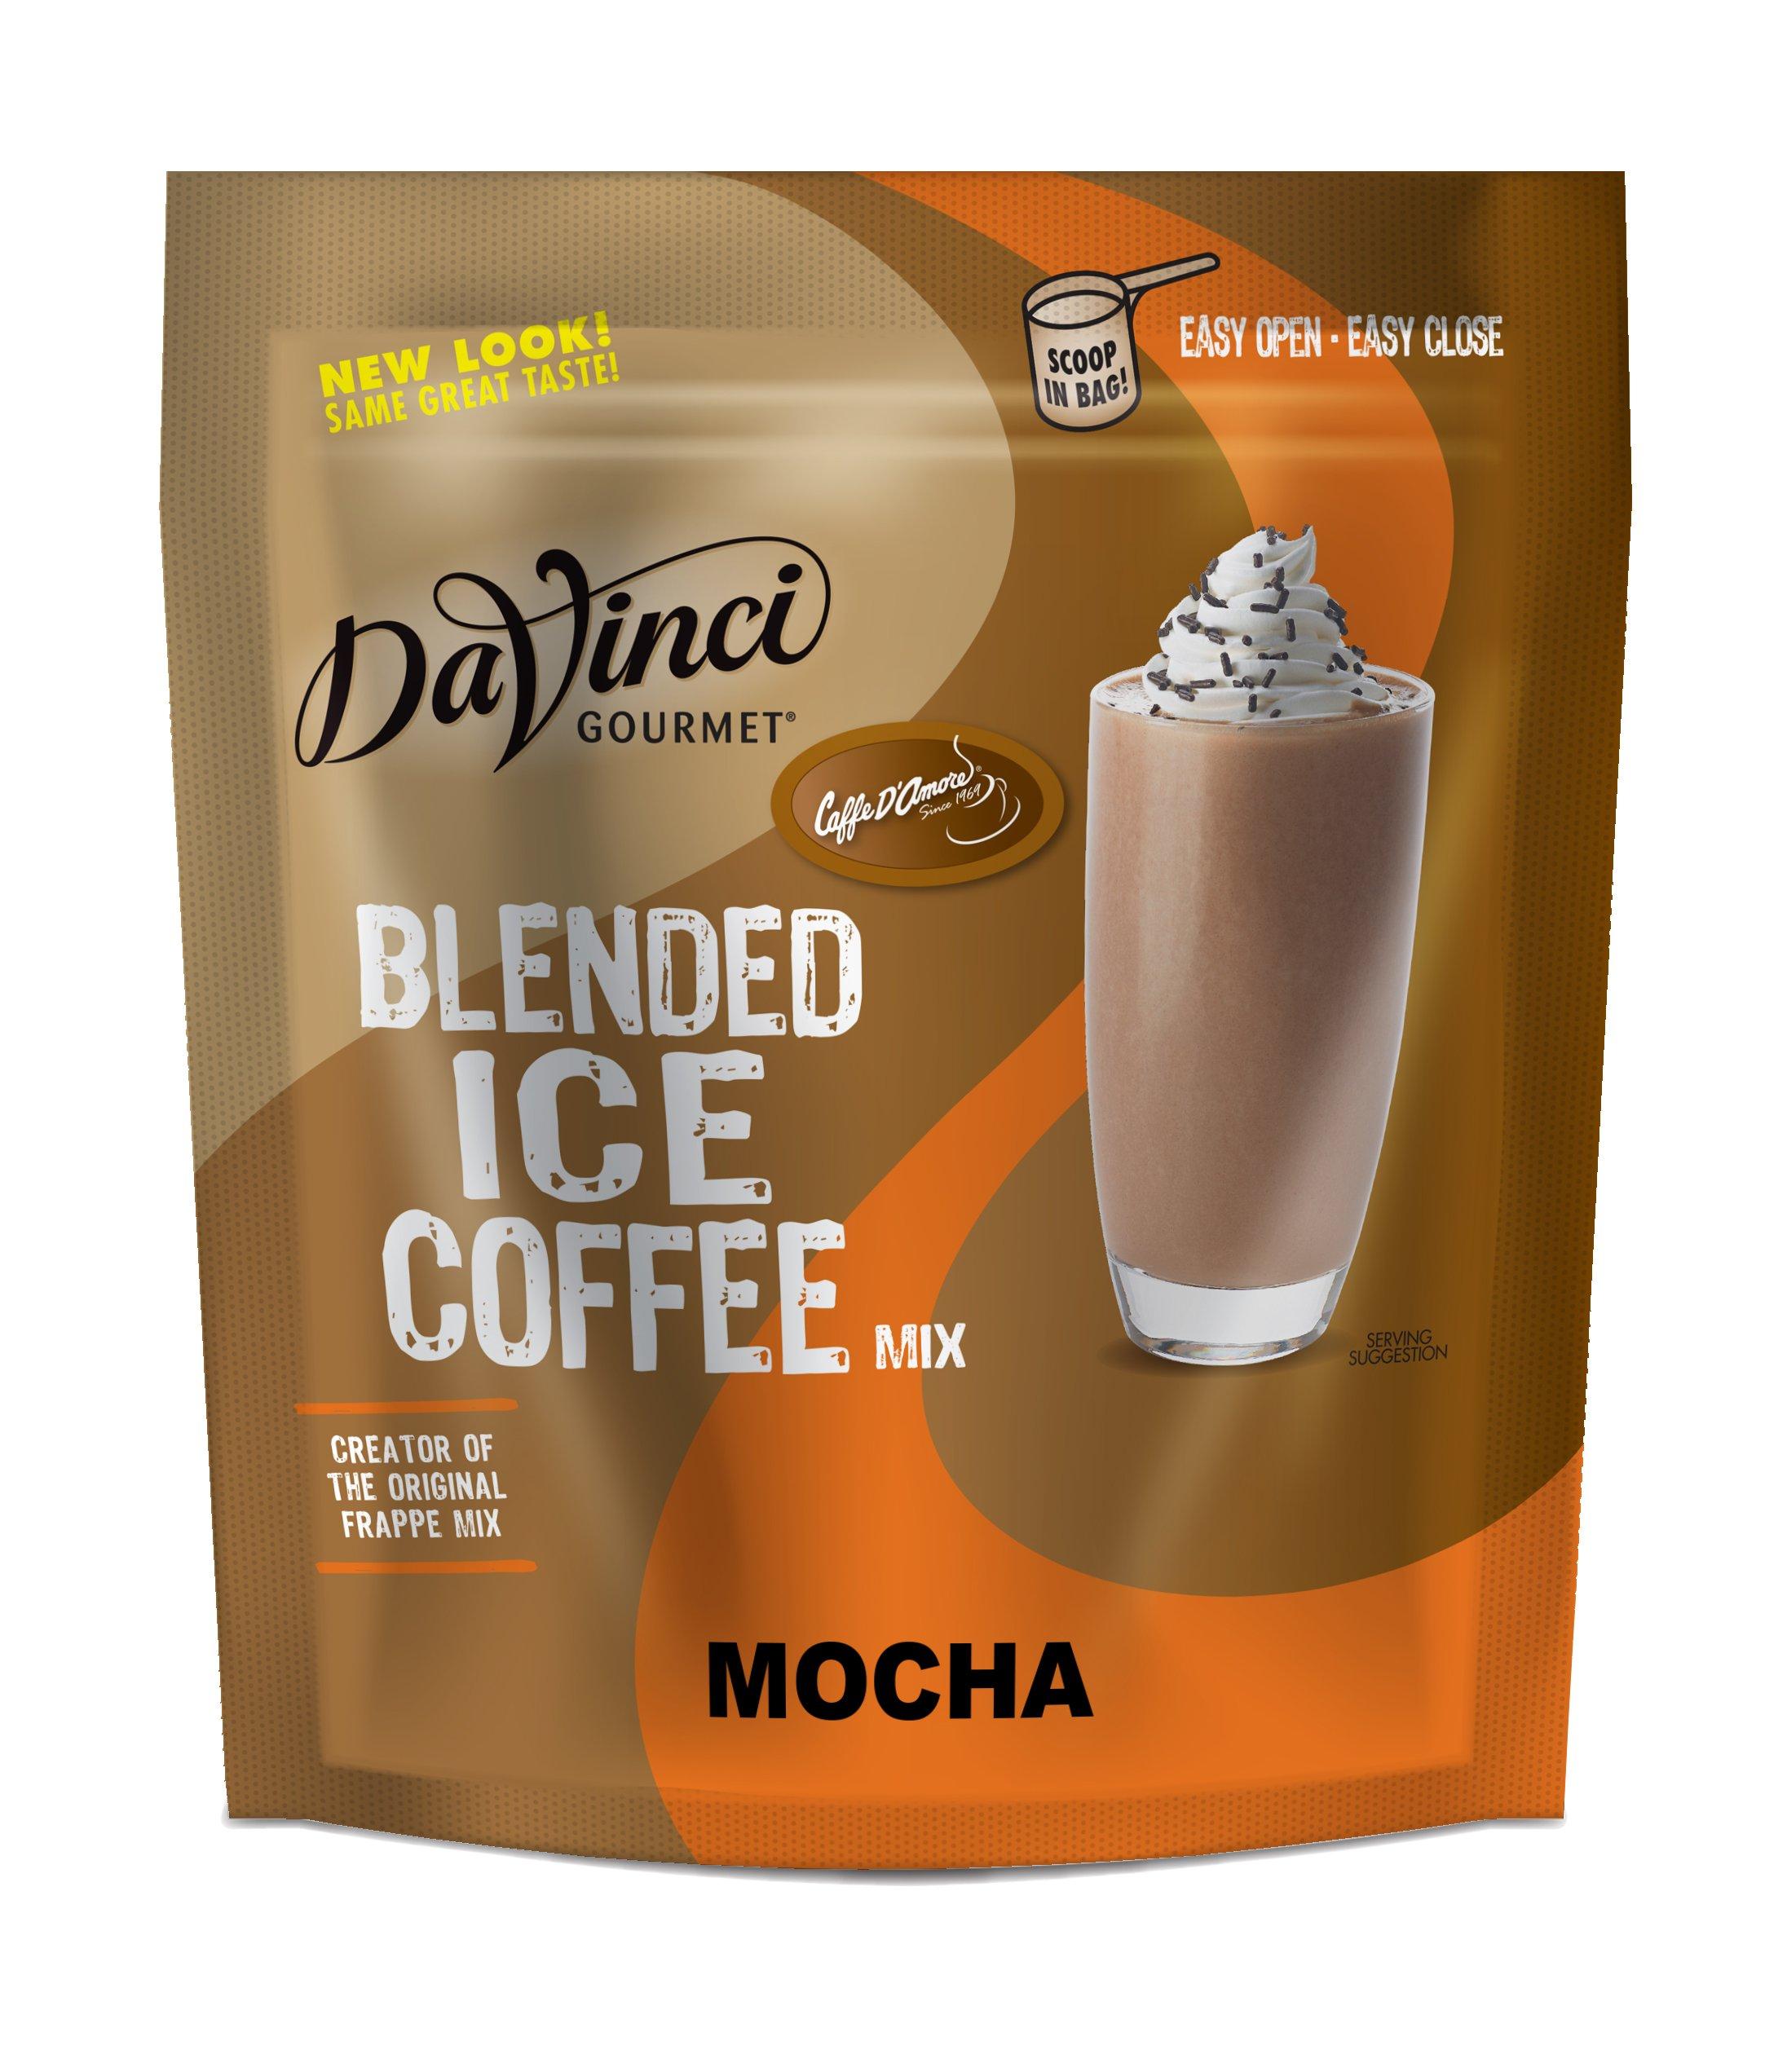 DaVinci Gourmet Blended Ice Coffee Mix, Mocha, 3 Pound by Jet